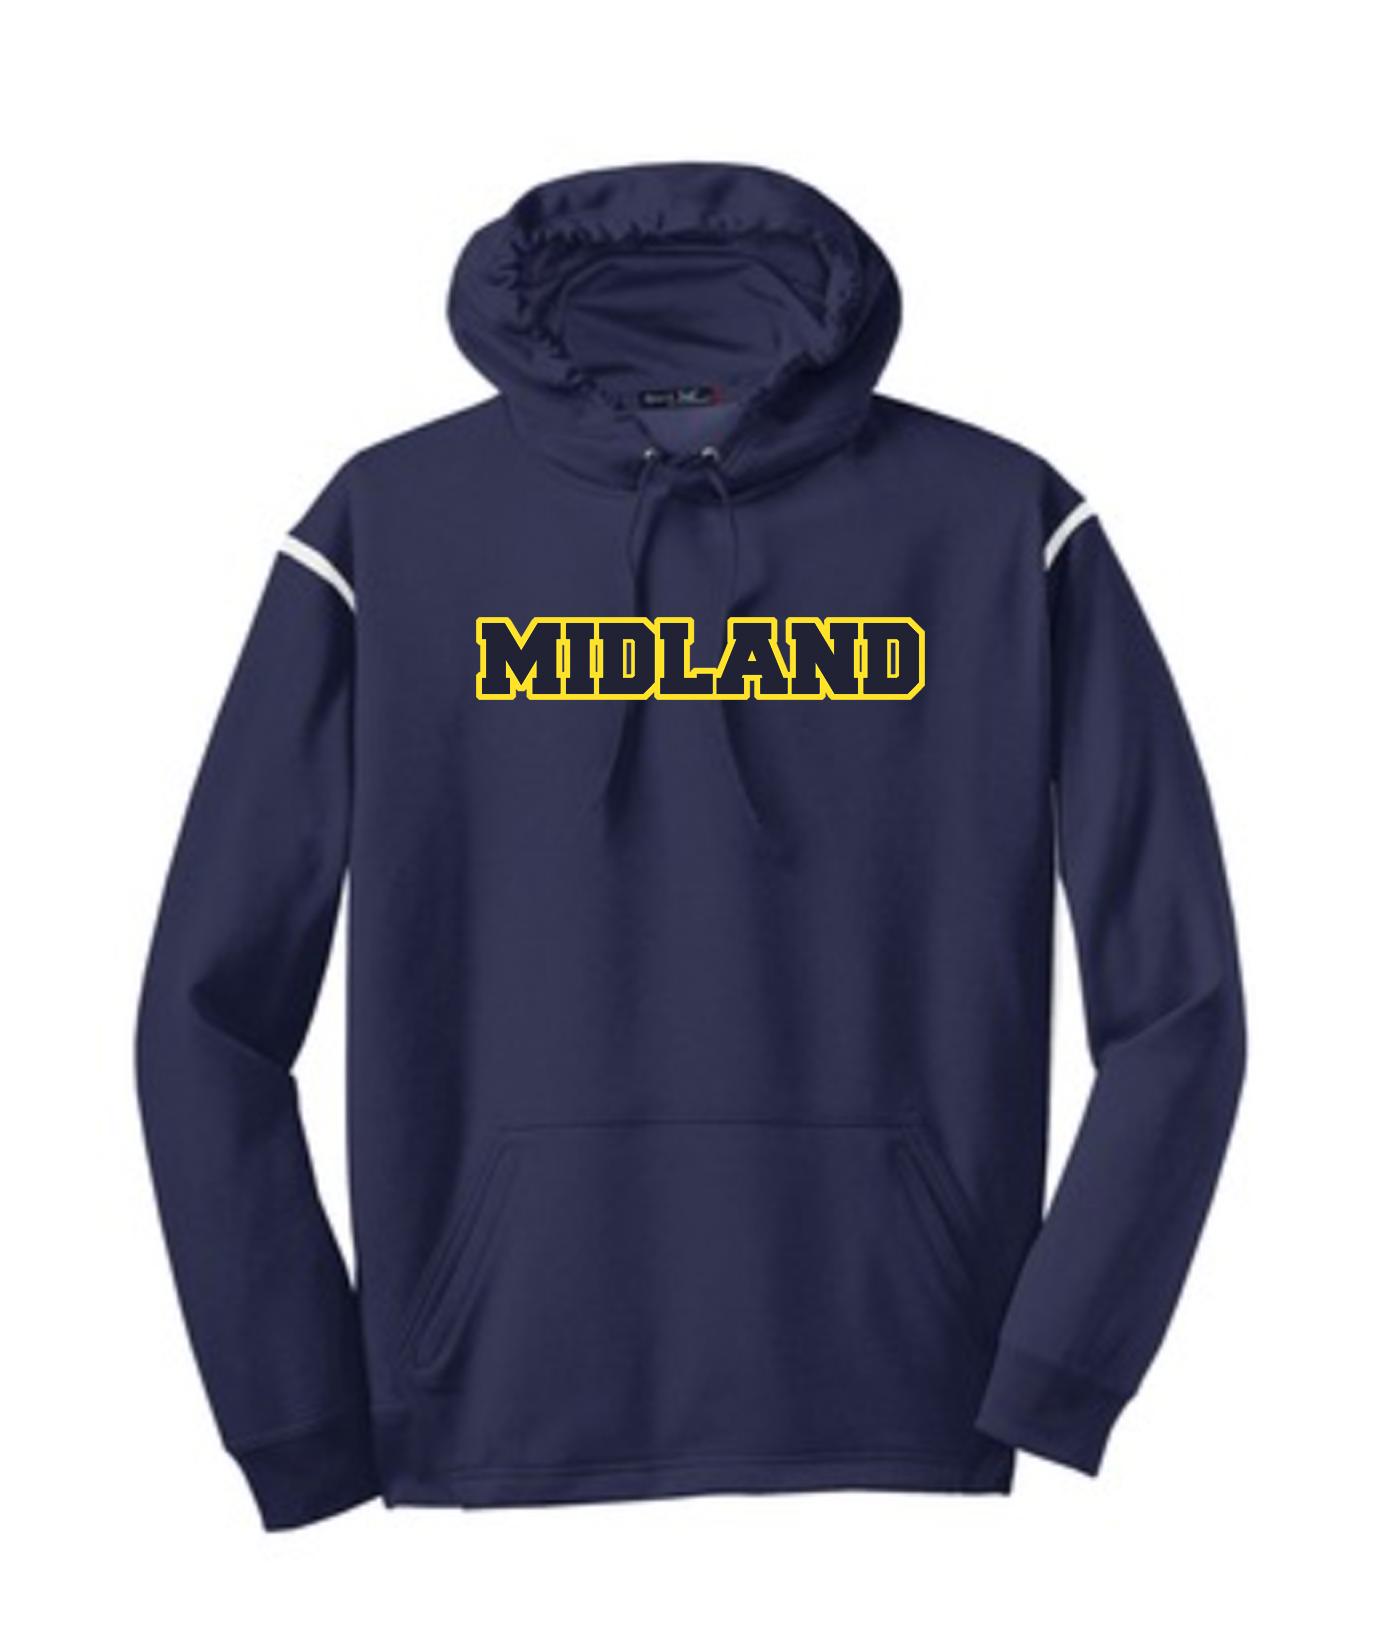 Sport-Tek Navy Tech Fleece Colorblock Hooded Sweatshirt Color Midland Gold Outline Navy Inside